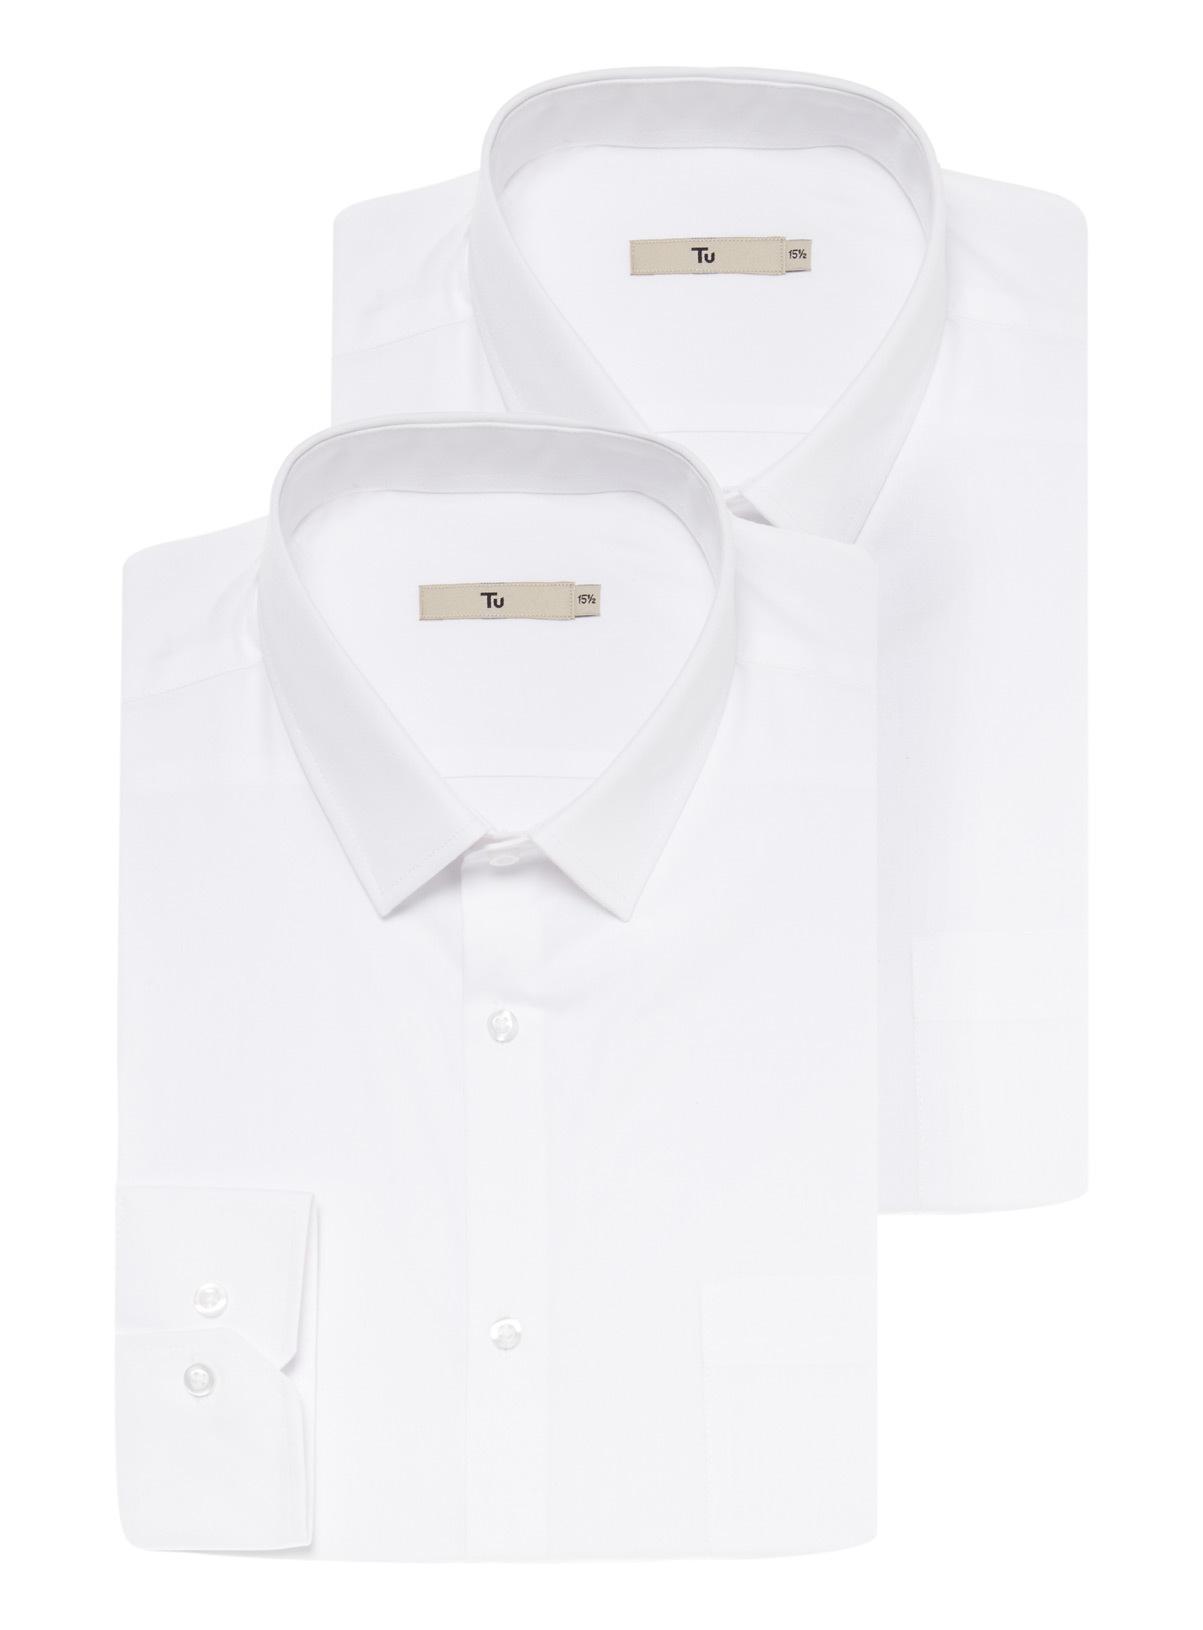 T shirt slim fit white - White Slim Fit Shirts 2 Pack